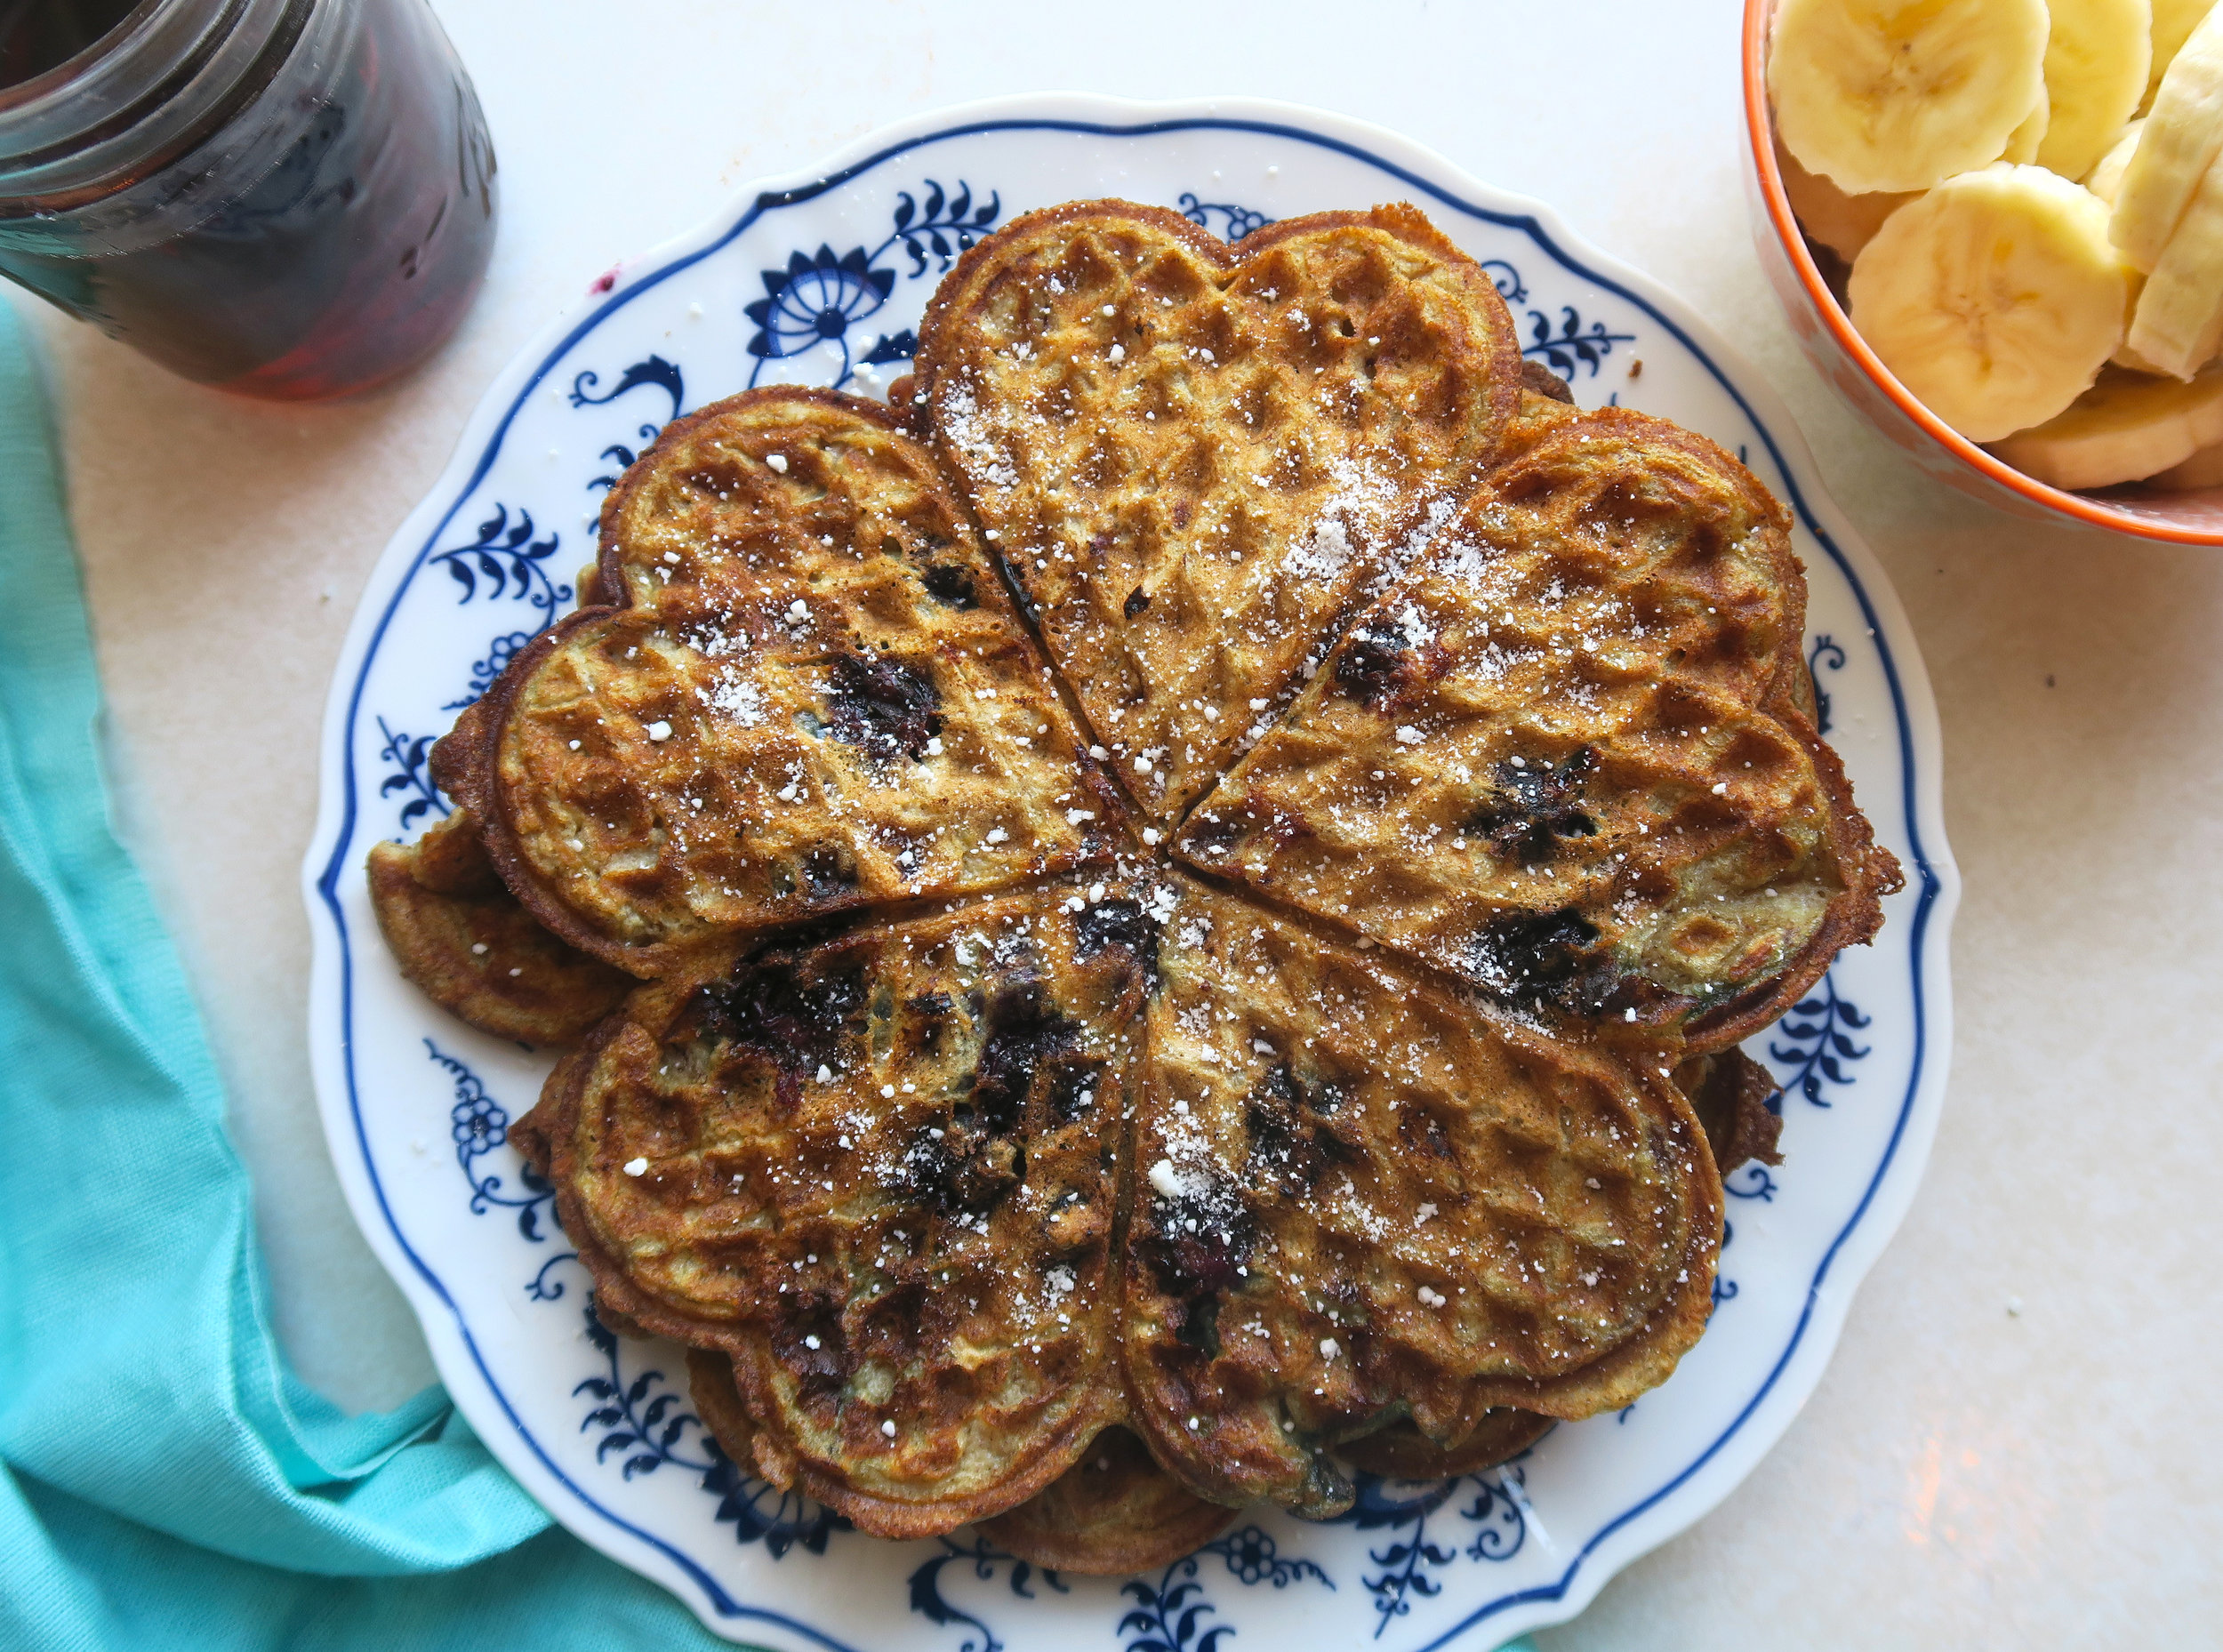 blueberry banana waffles, lake superior kitchen, duluth food, healthy breakfast, brunch